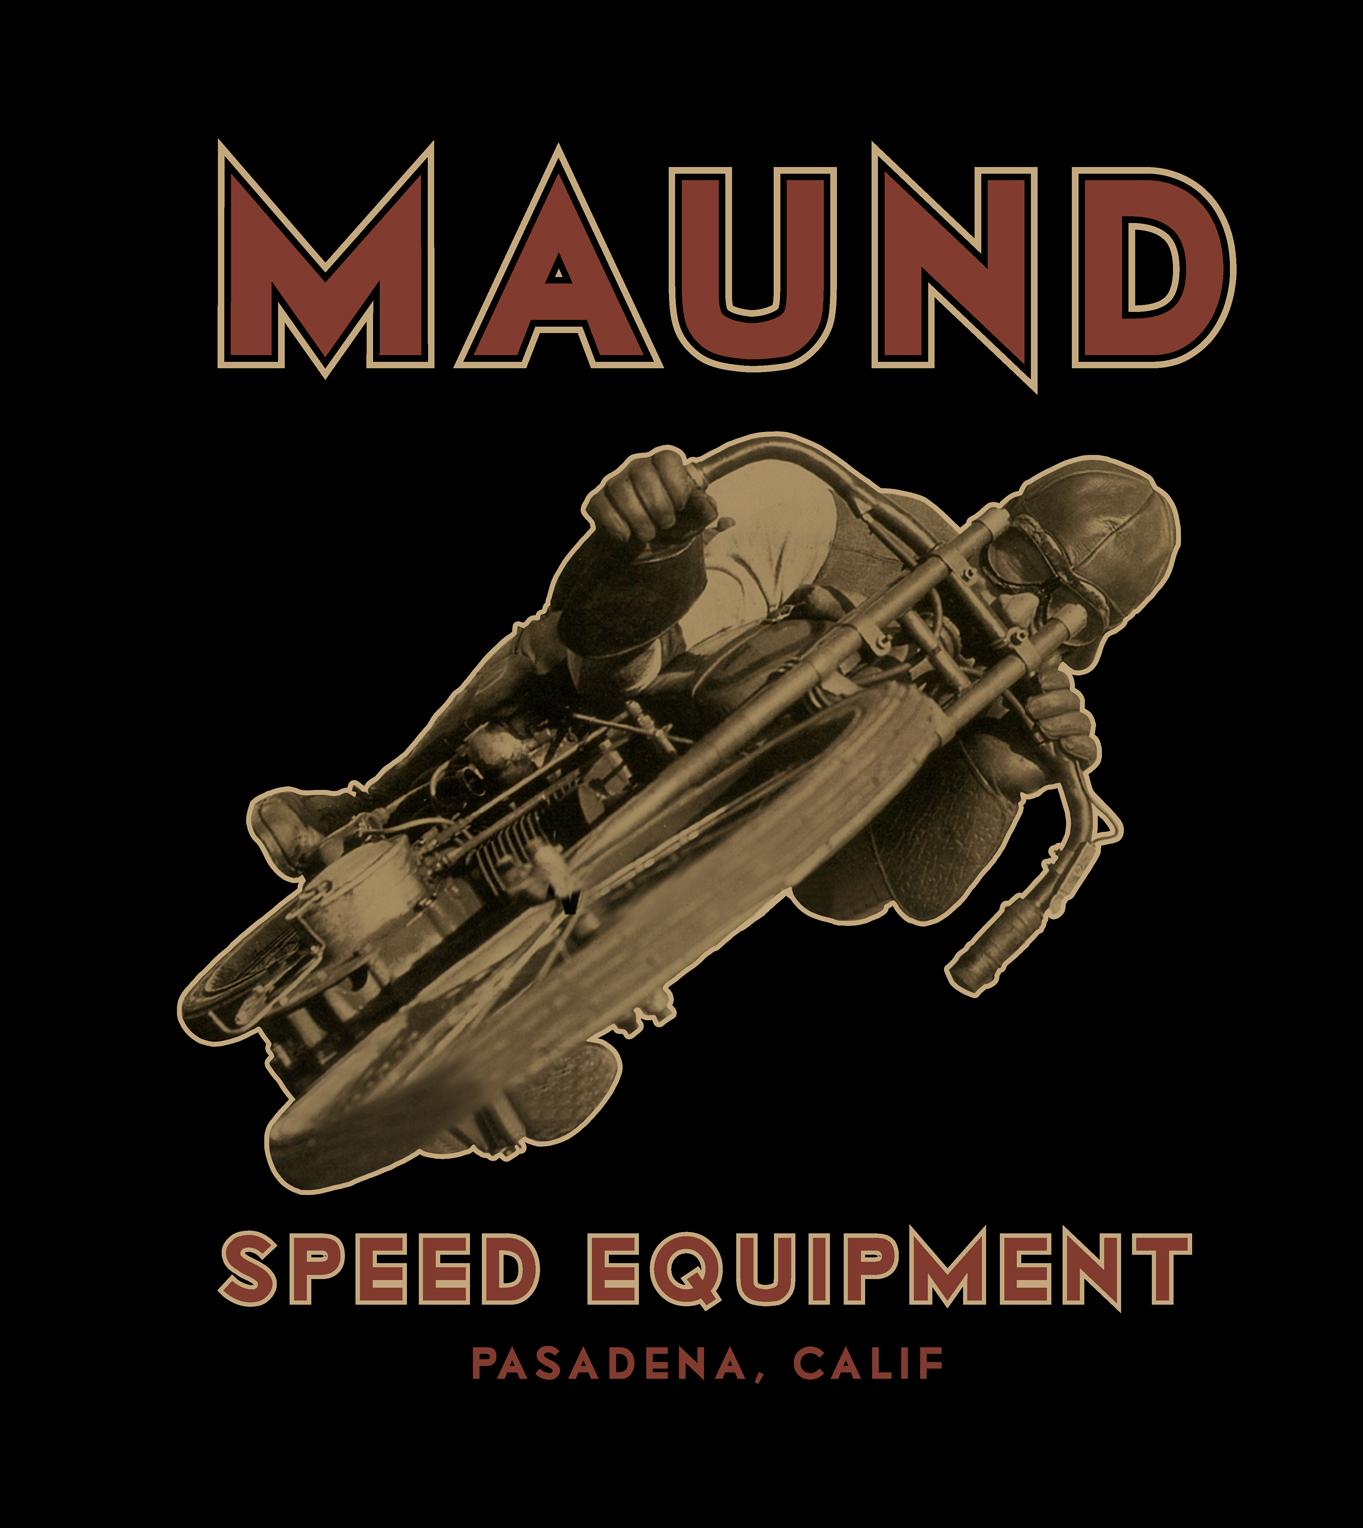 Maundspeed